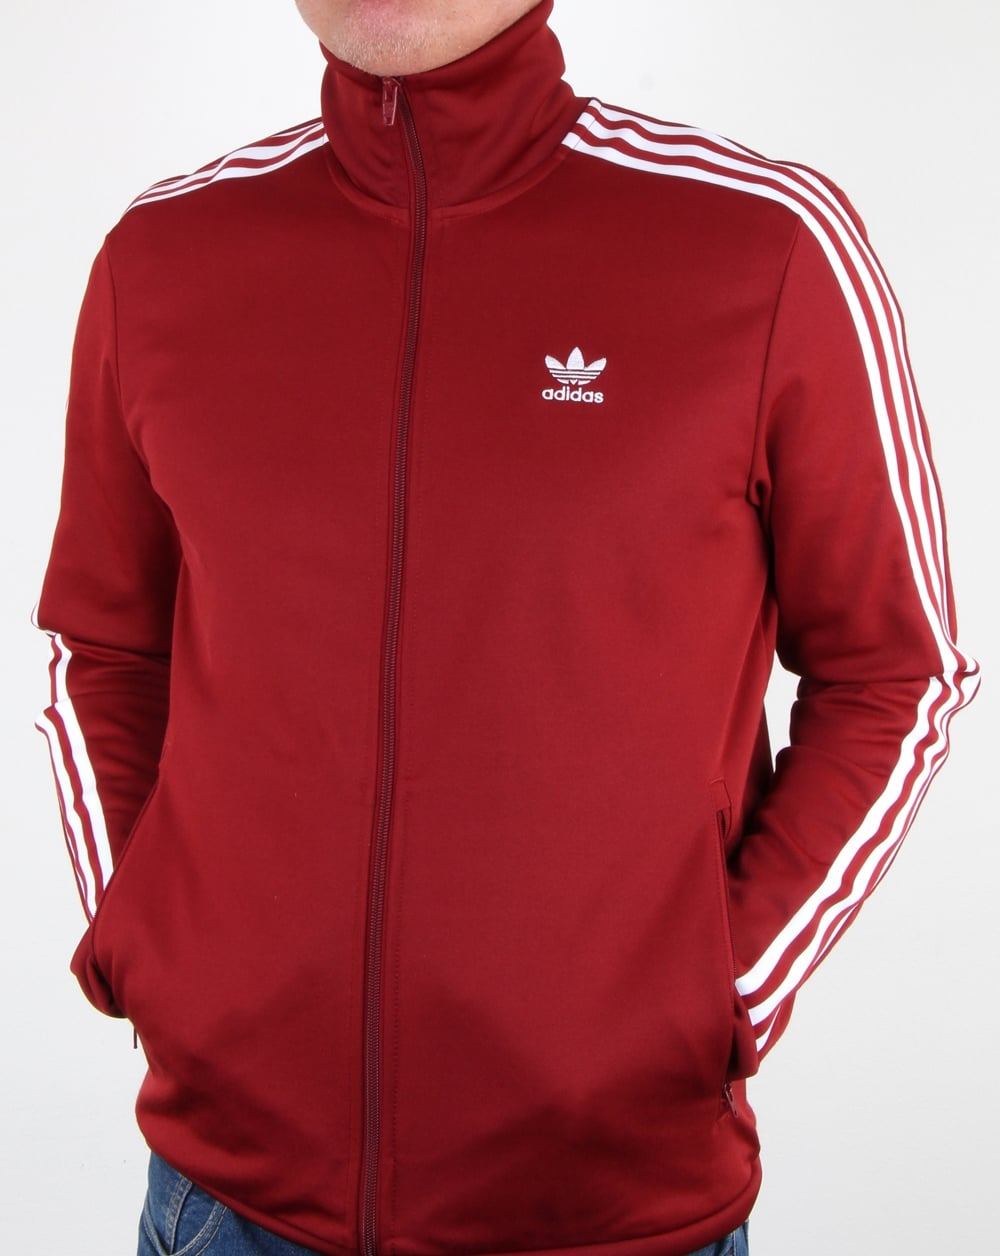 Adidas Originals Beckenbauer Track Top Rust Redjacket ...